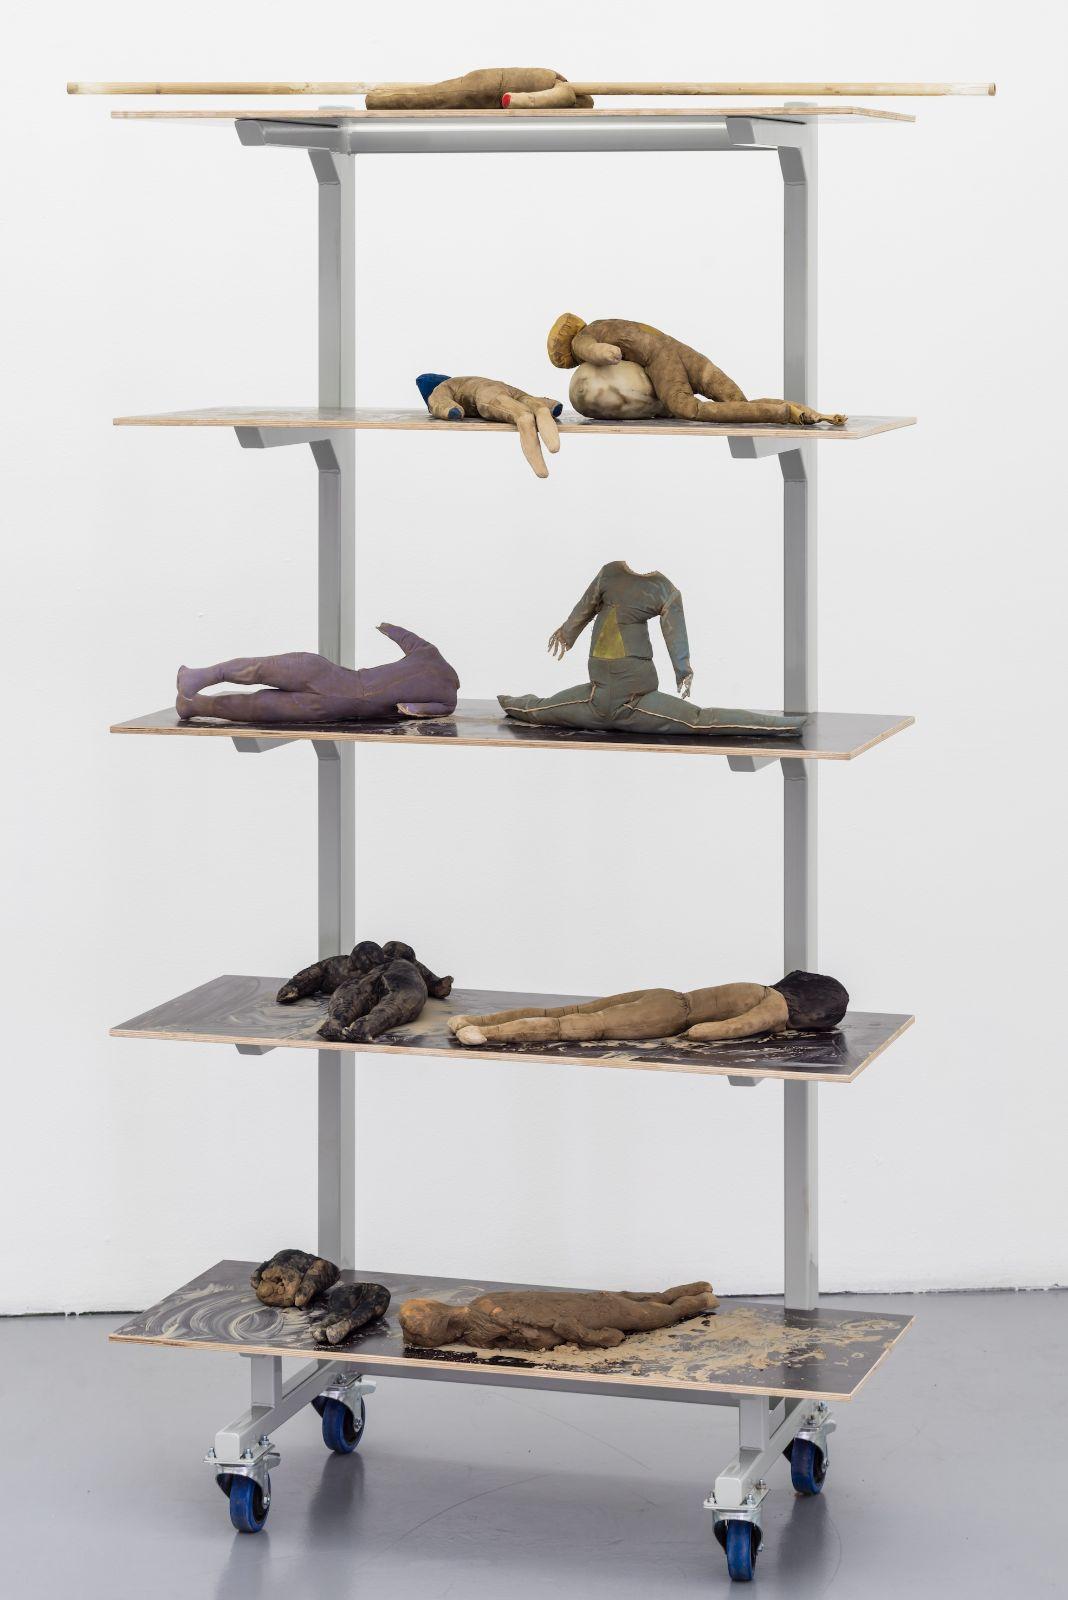 Large E-shelf, 2015, steel, shelf, clay, glass tube, fabric, 230 x 85 x 60 cm